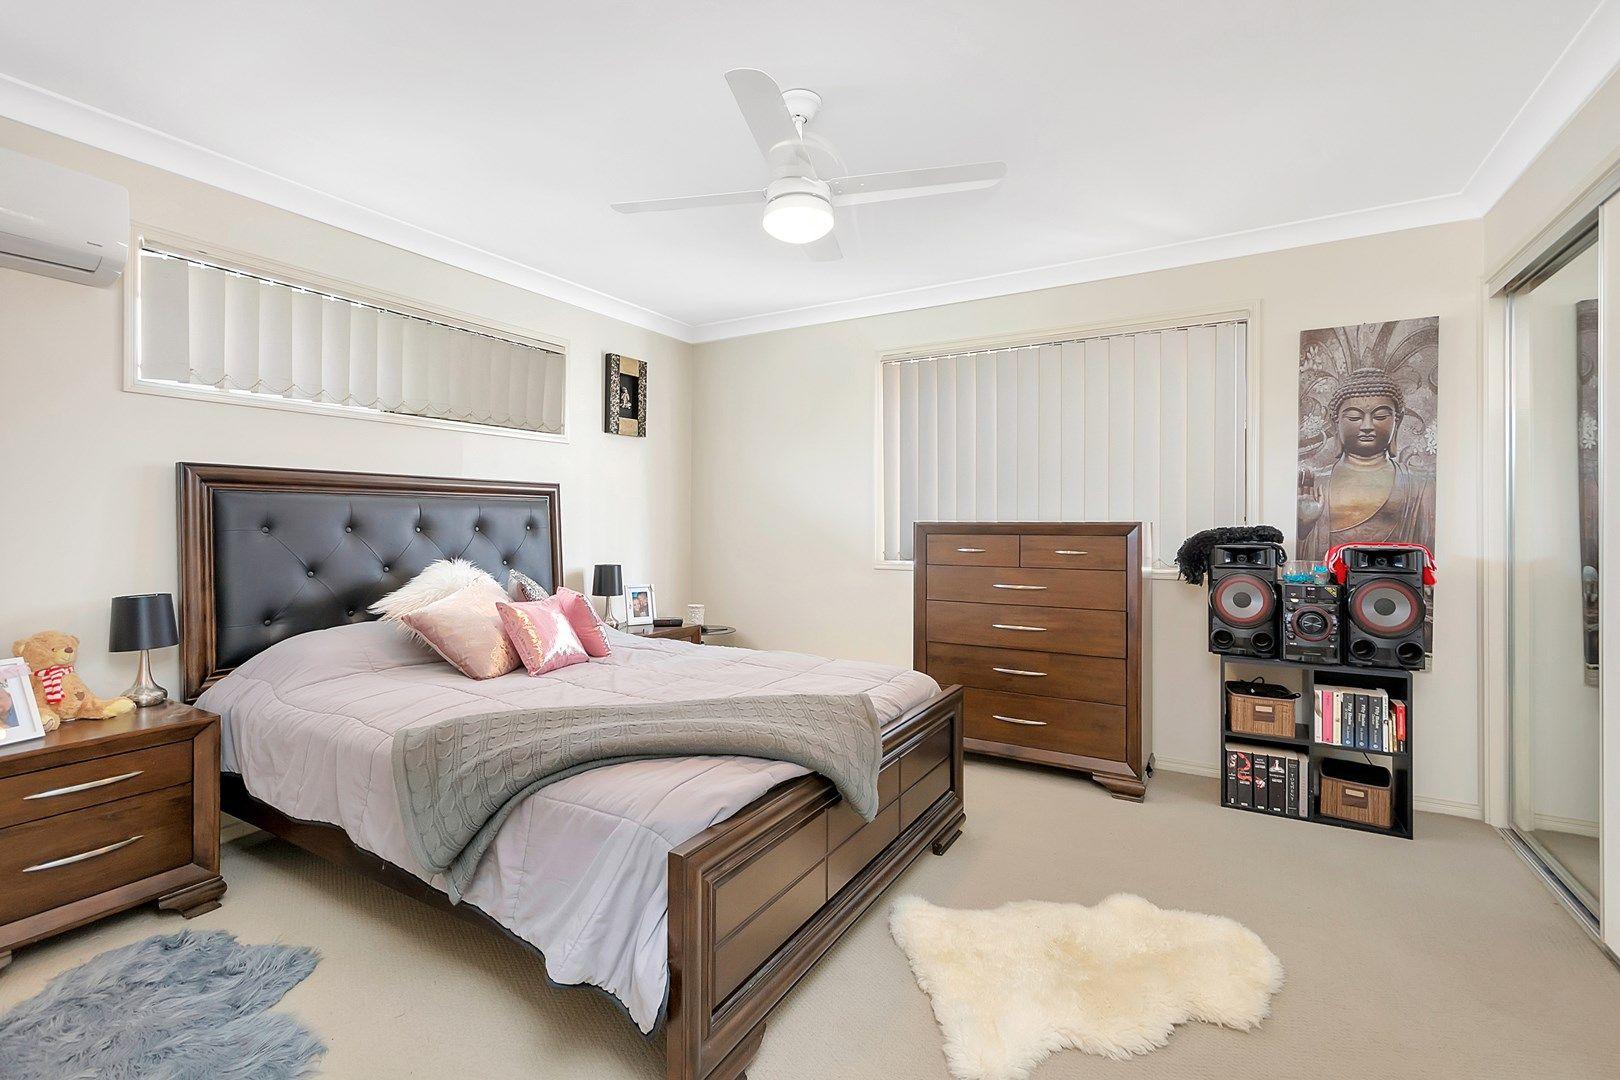 13/21B Hunter Street, Brassall QLD 4305, Image 0